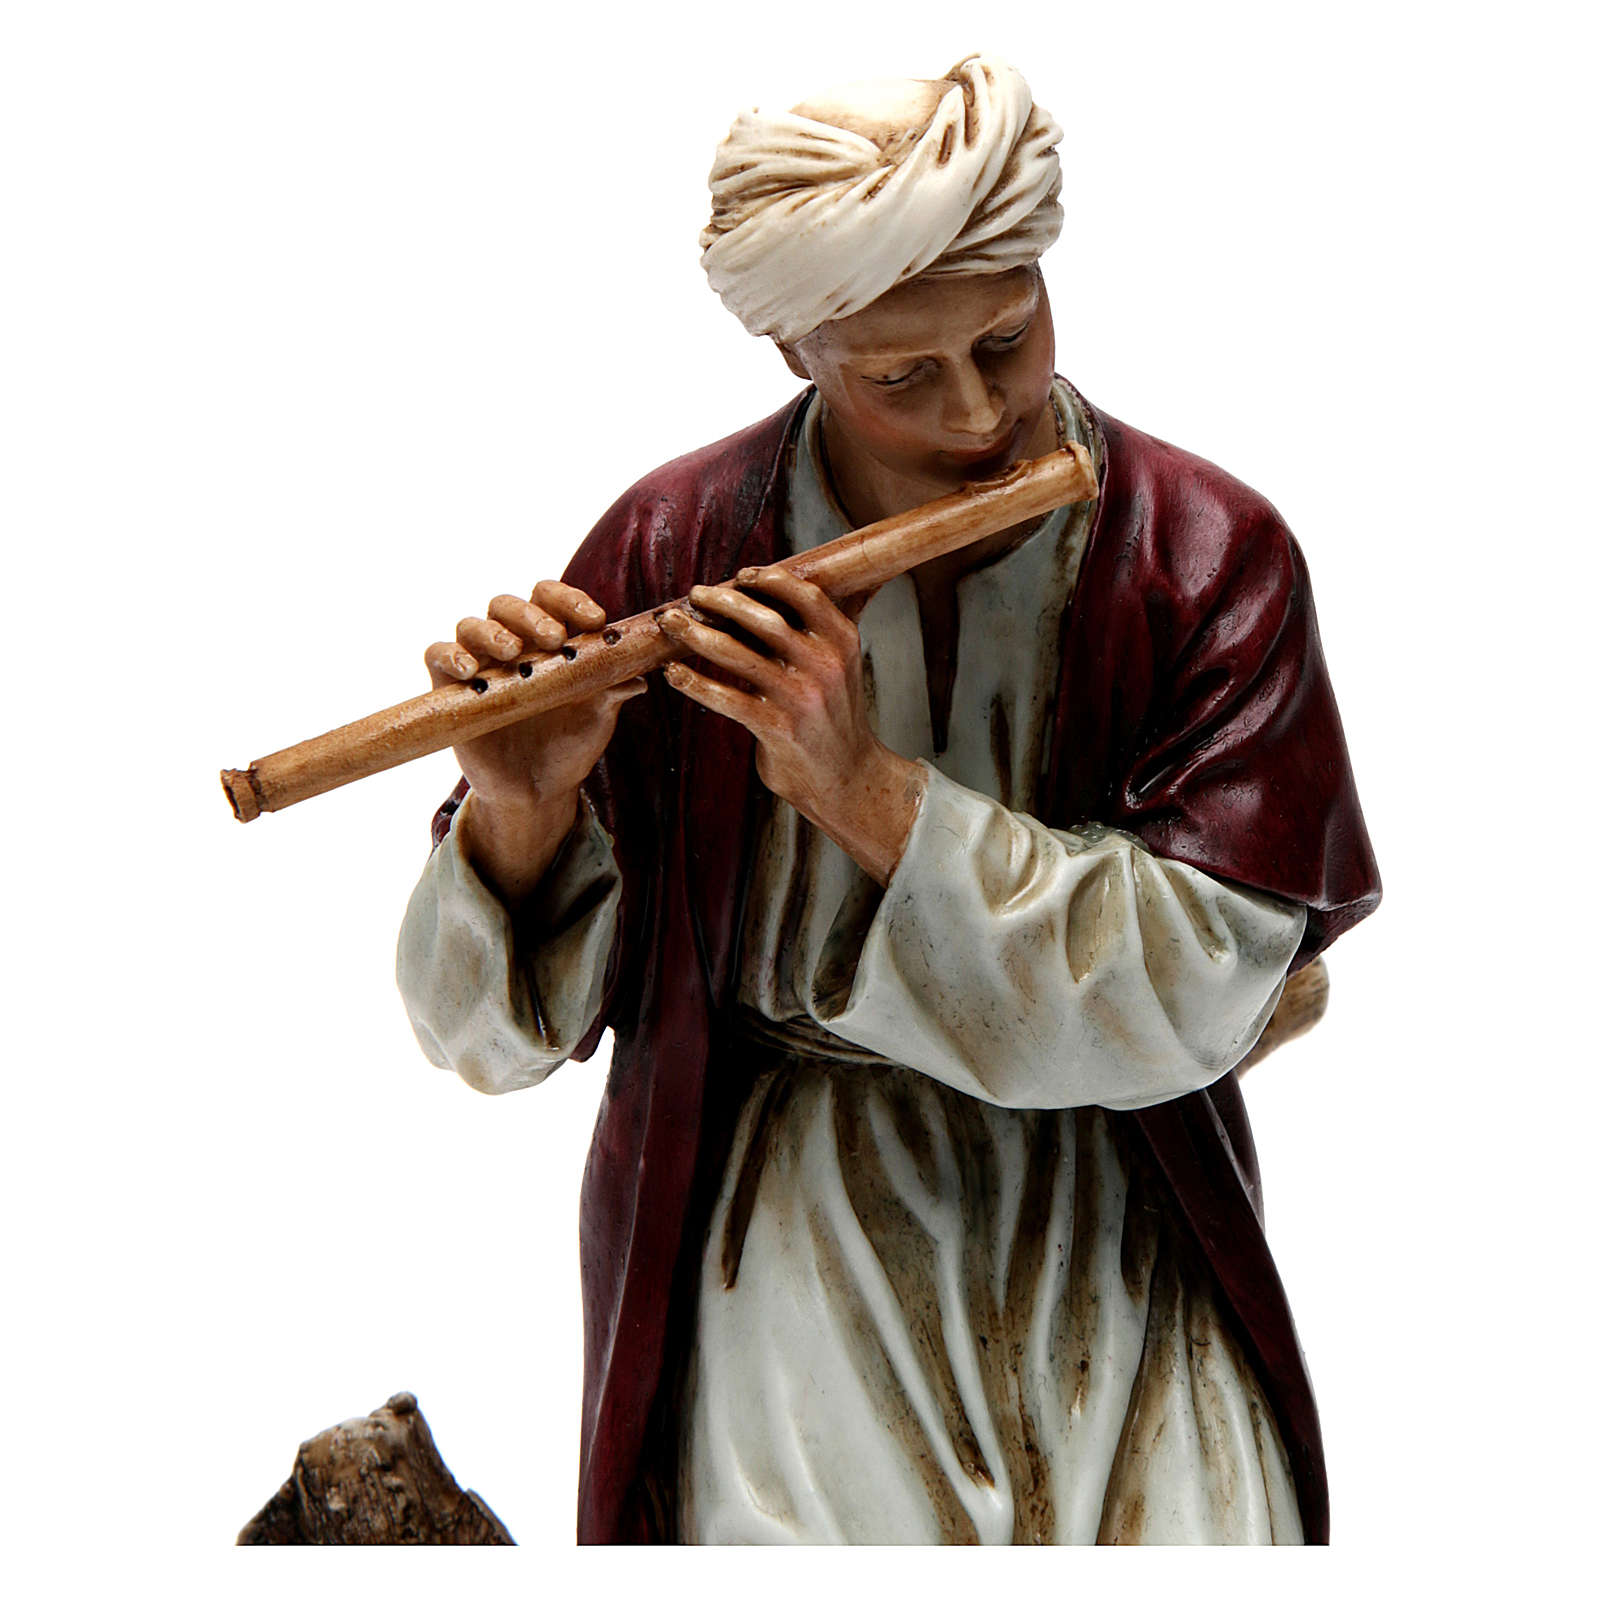 Flautista resina per presepe 20 cm Moranduzzo 4